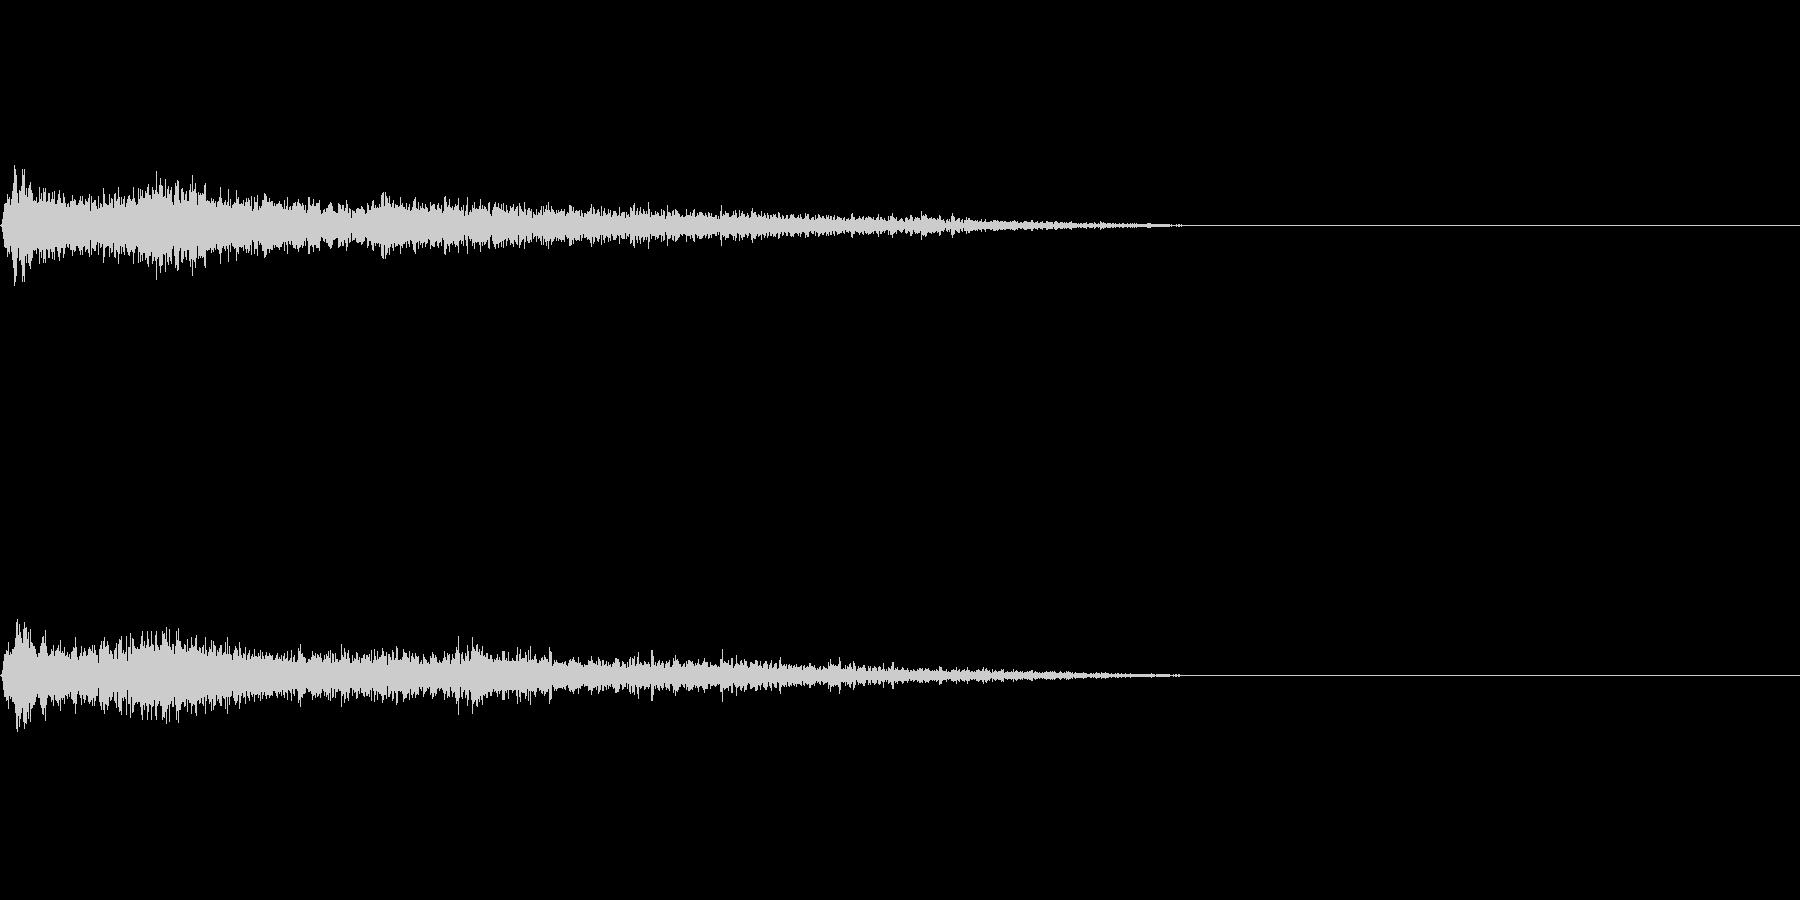 Eマイナーインパクト音 衝撃音の未再生の波形